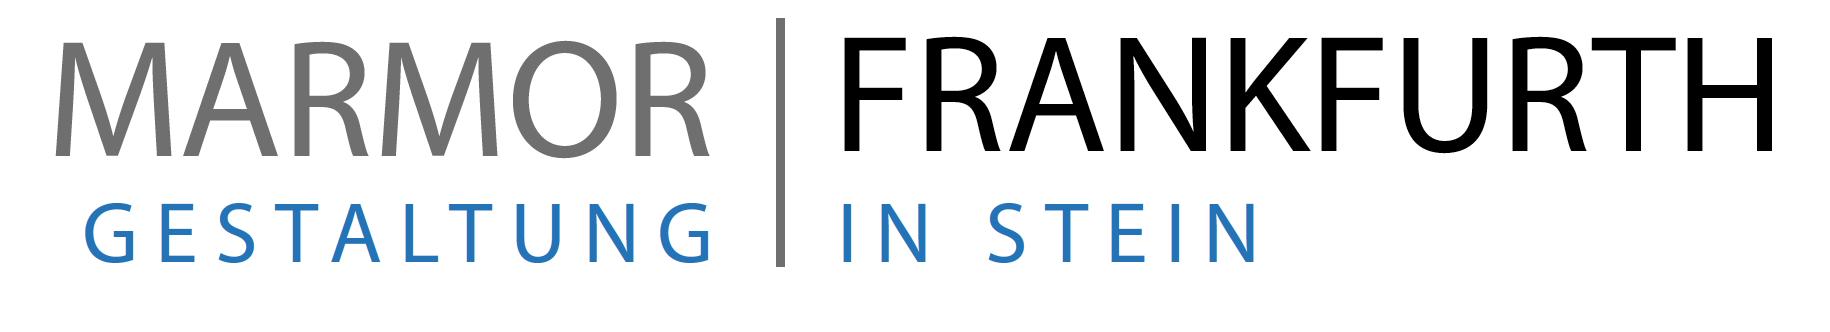 Marmor Frankfurth